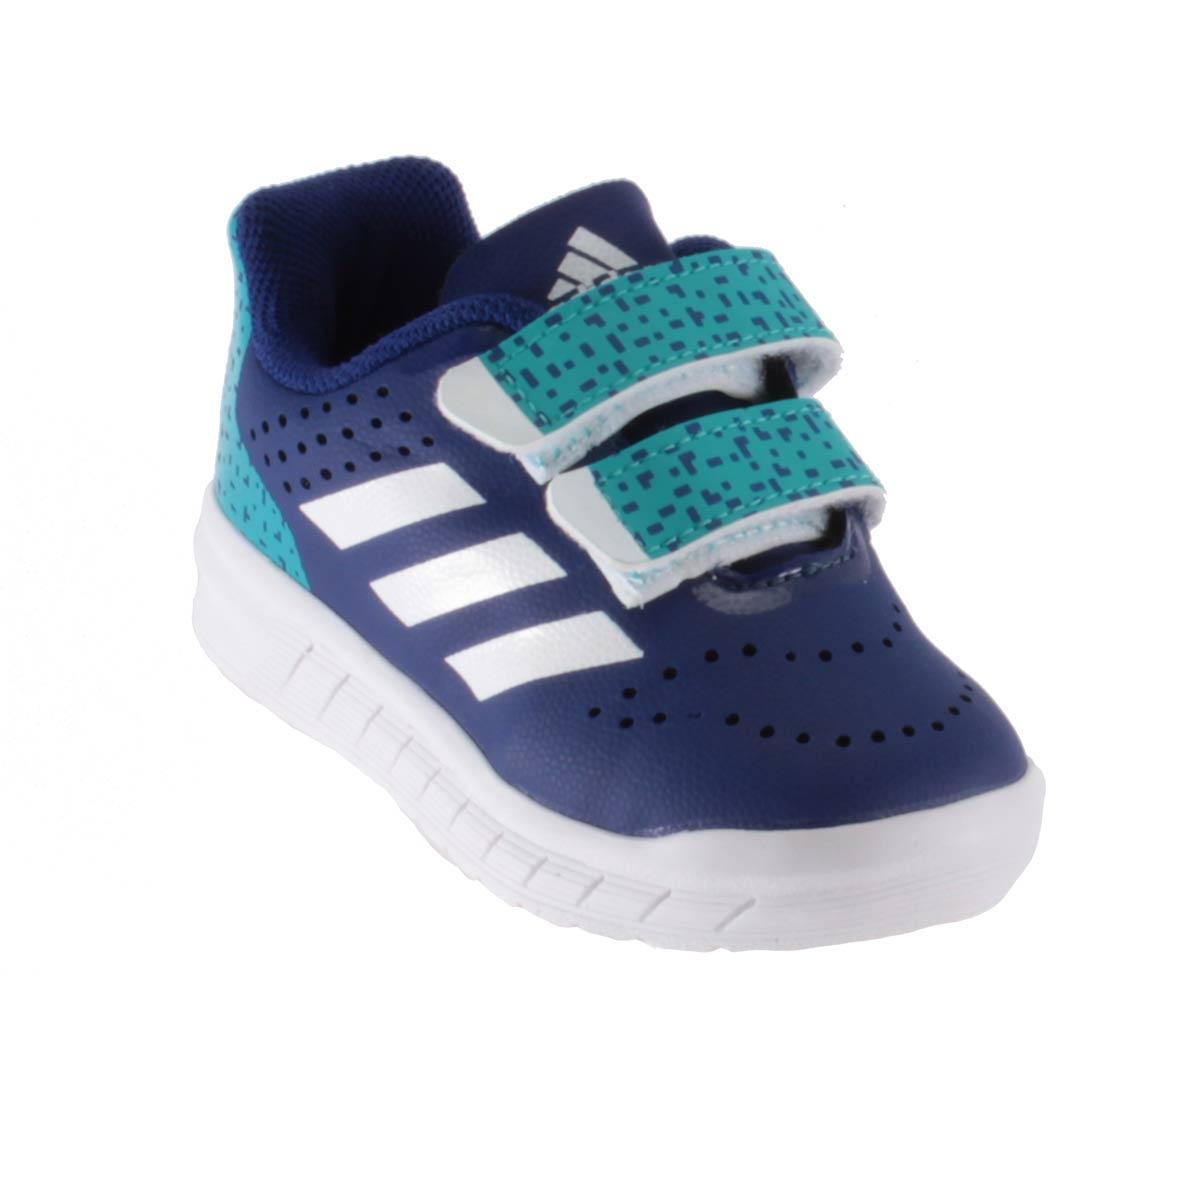 Tênis Adidas Quicksport CF Velcrom Infantil Menino